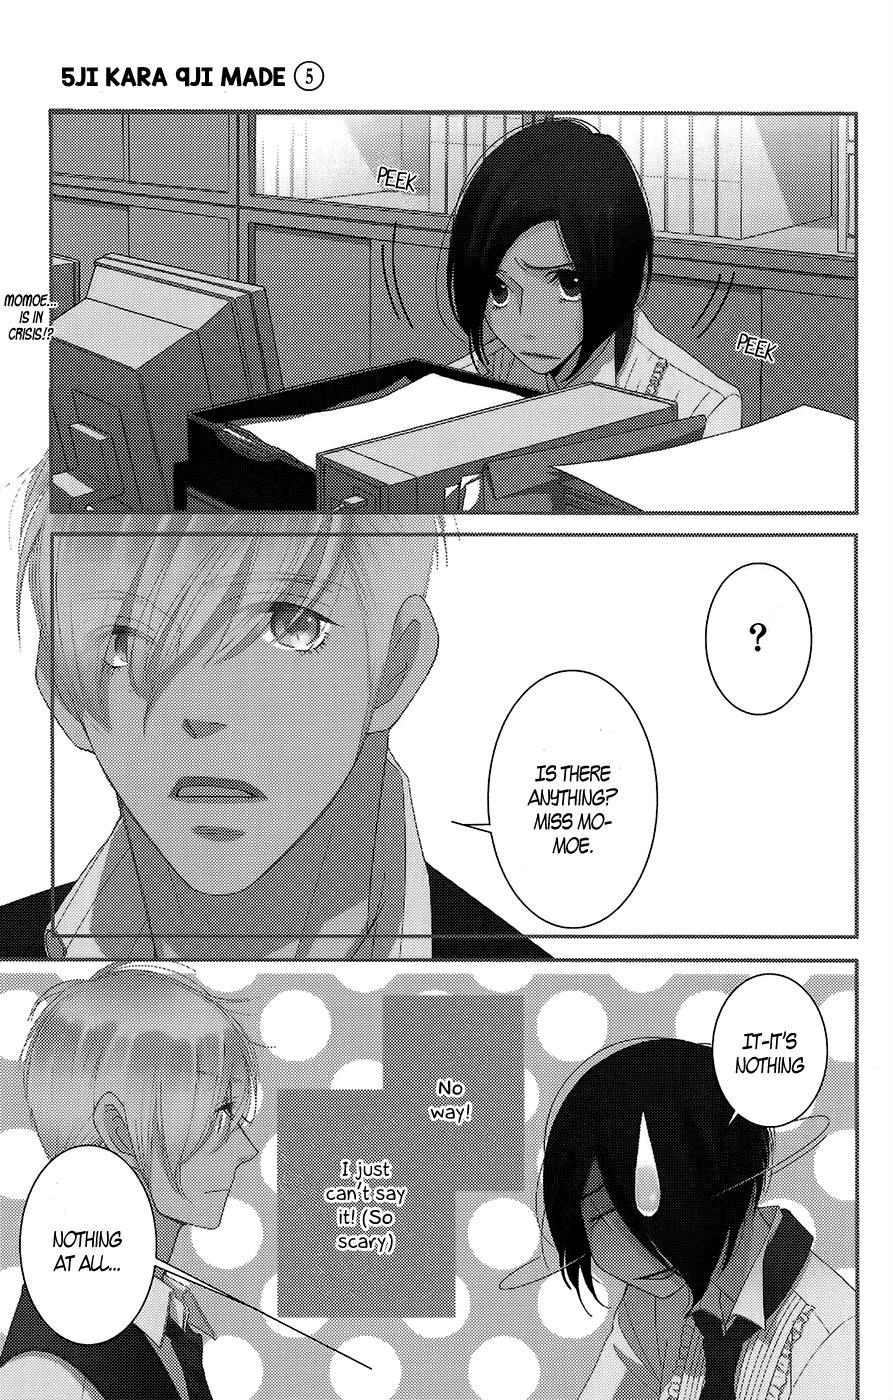 5-JI KARA 9-JI MADE - Chapter 22